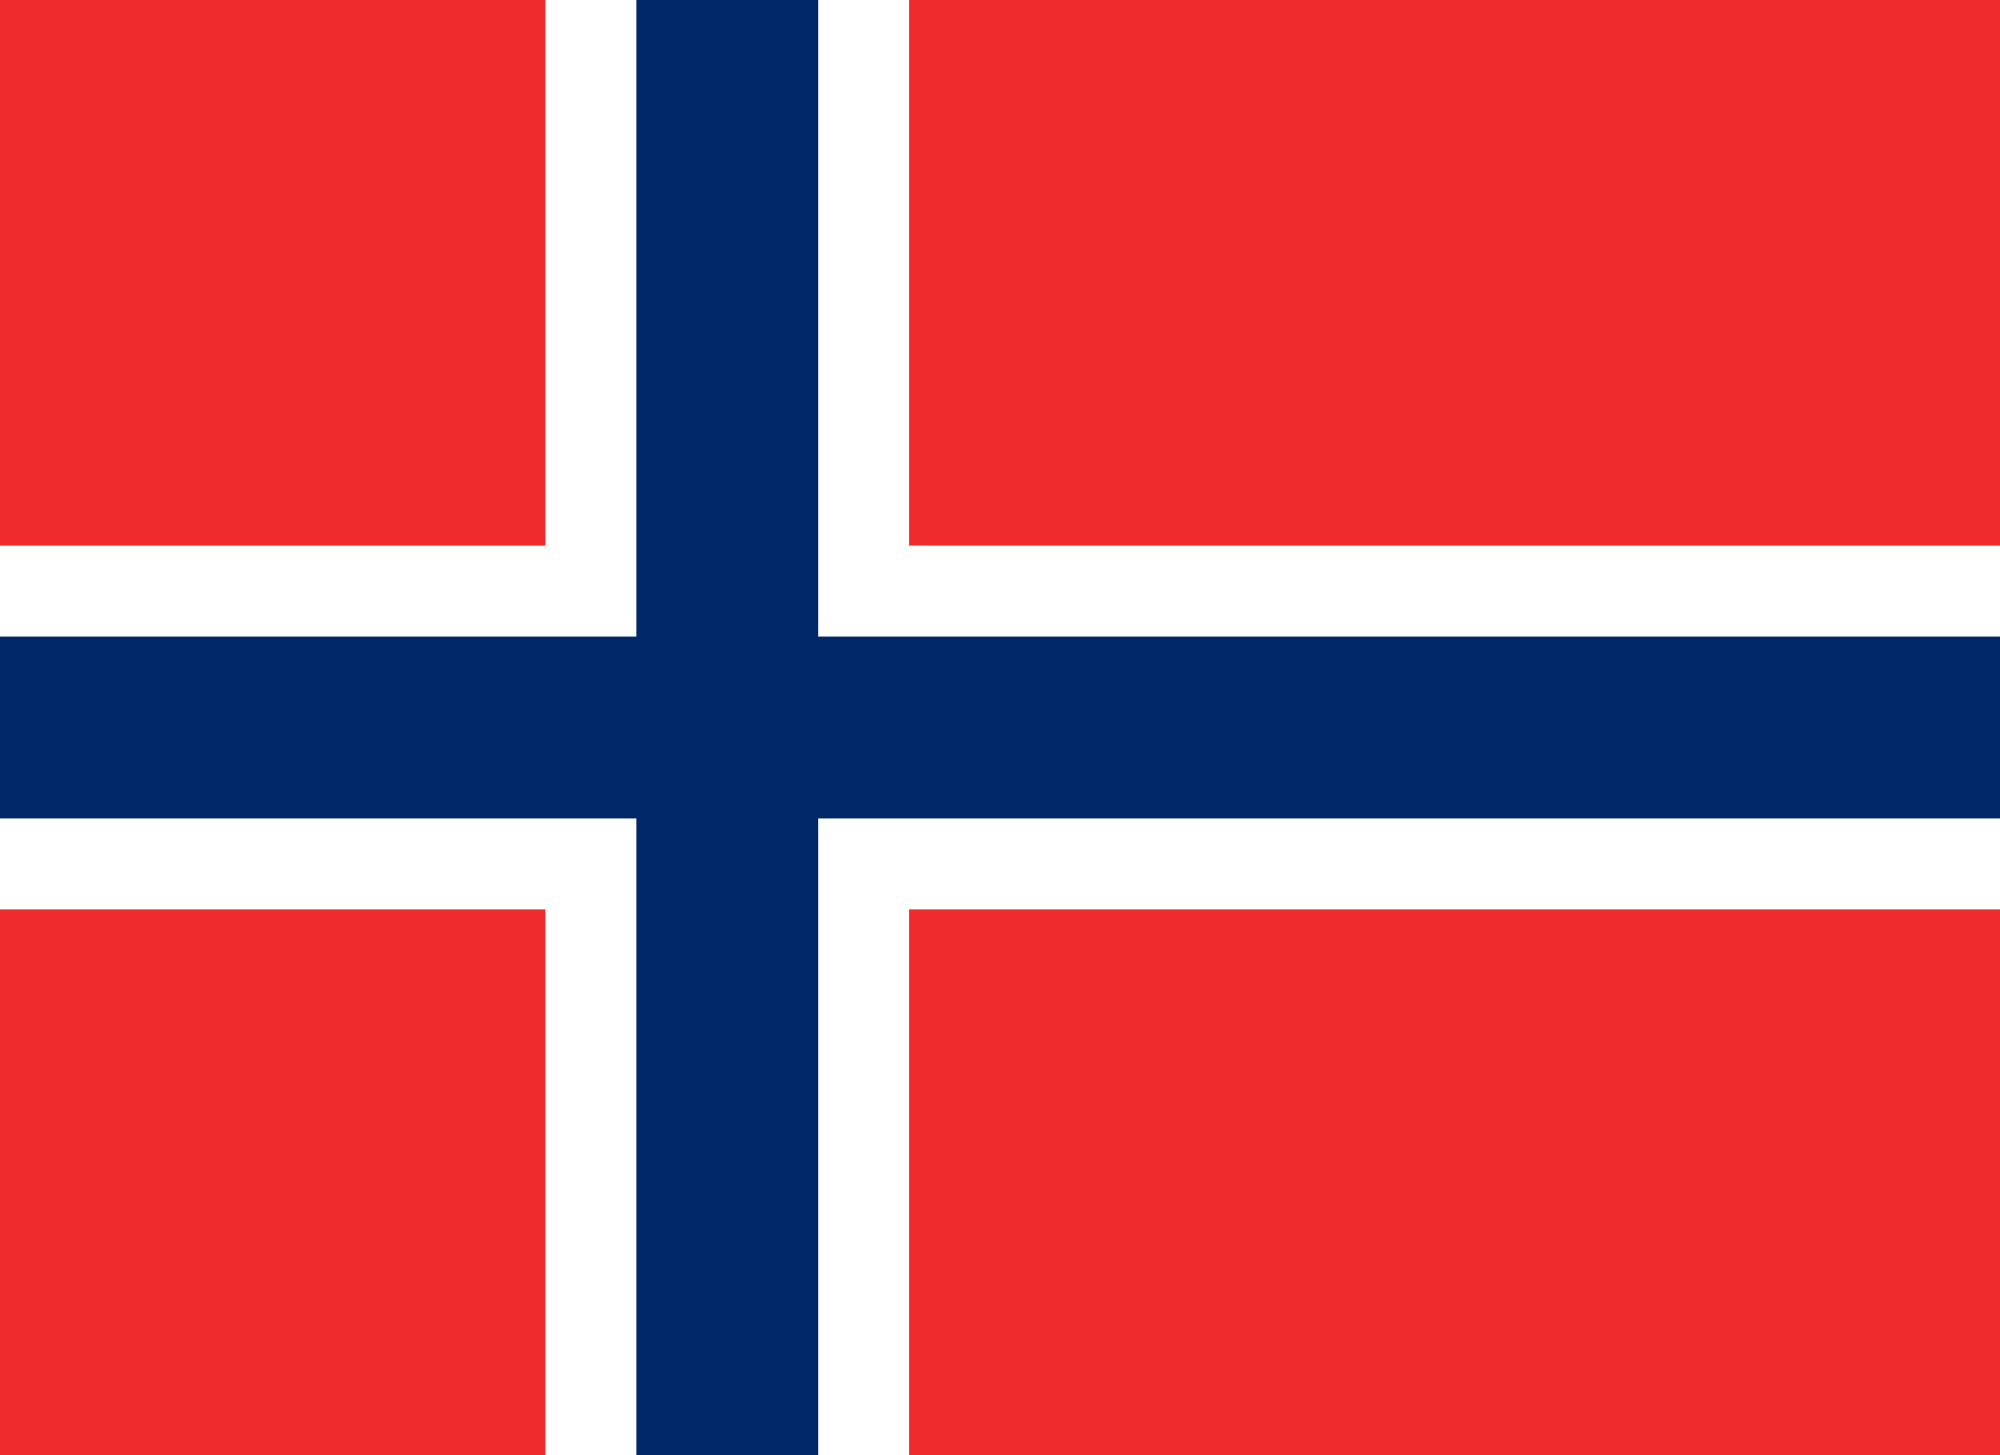 Svalbard e jan mayen, paese, emblema, logo, simbolo - Sfondi HD - Professor-falken.com